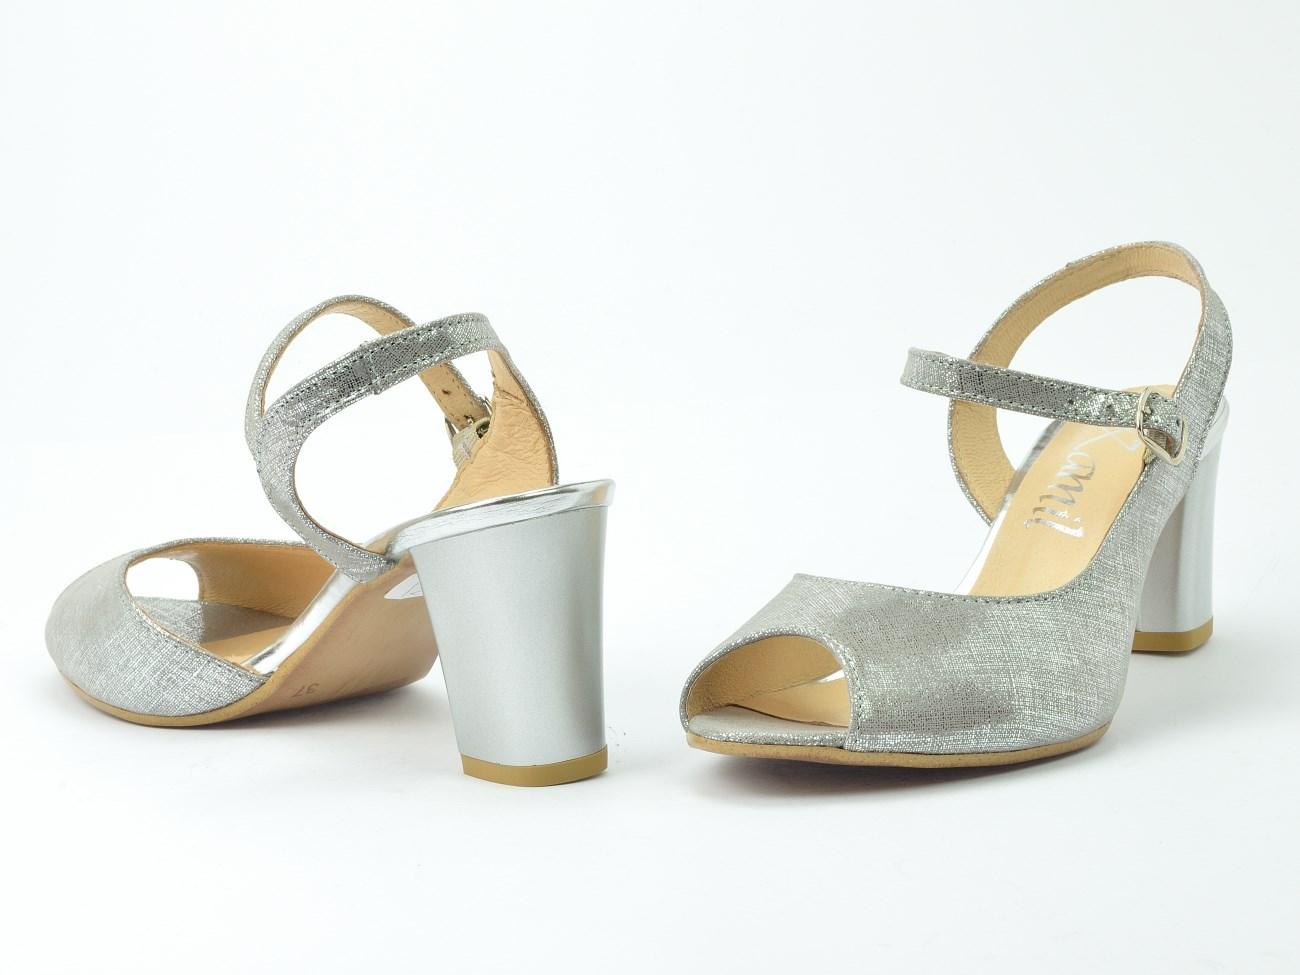 Sandały Kamil 1306 srebroszary